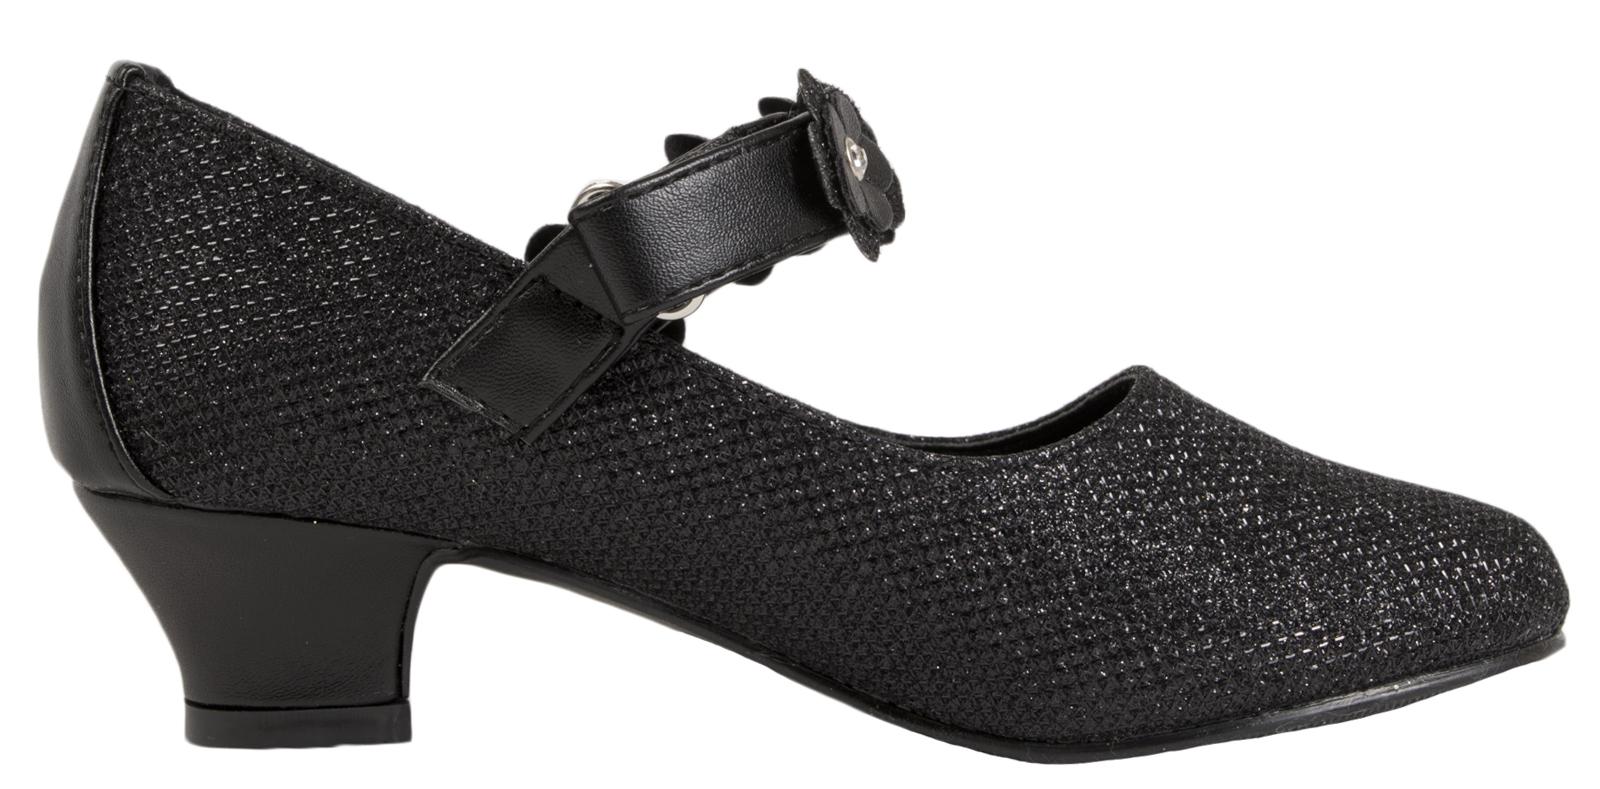 Diamante Glitter Wedding Party Shoes Bridesmaids Kids Girls Mary Jane Low Heels